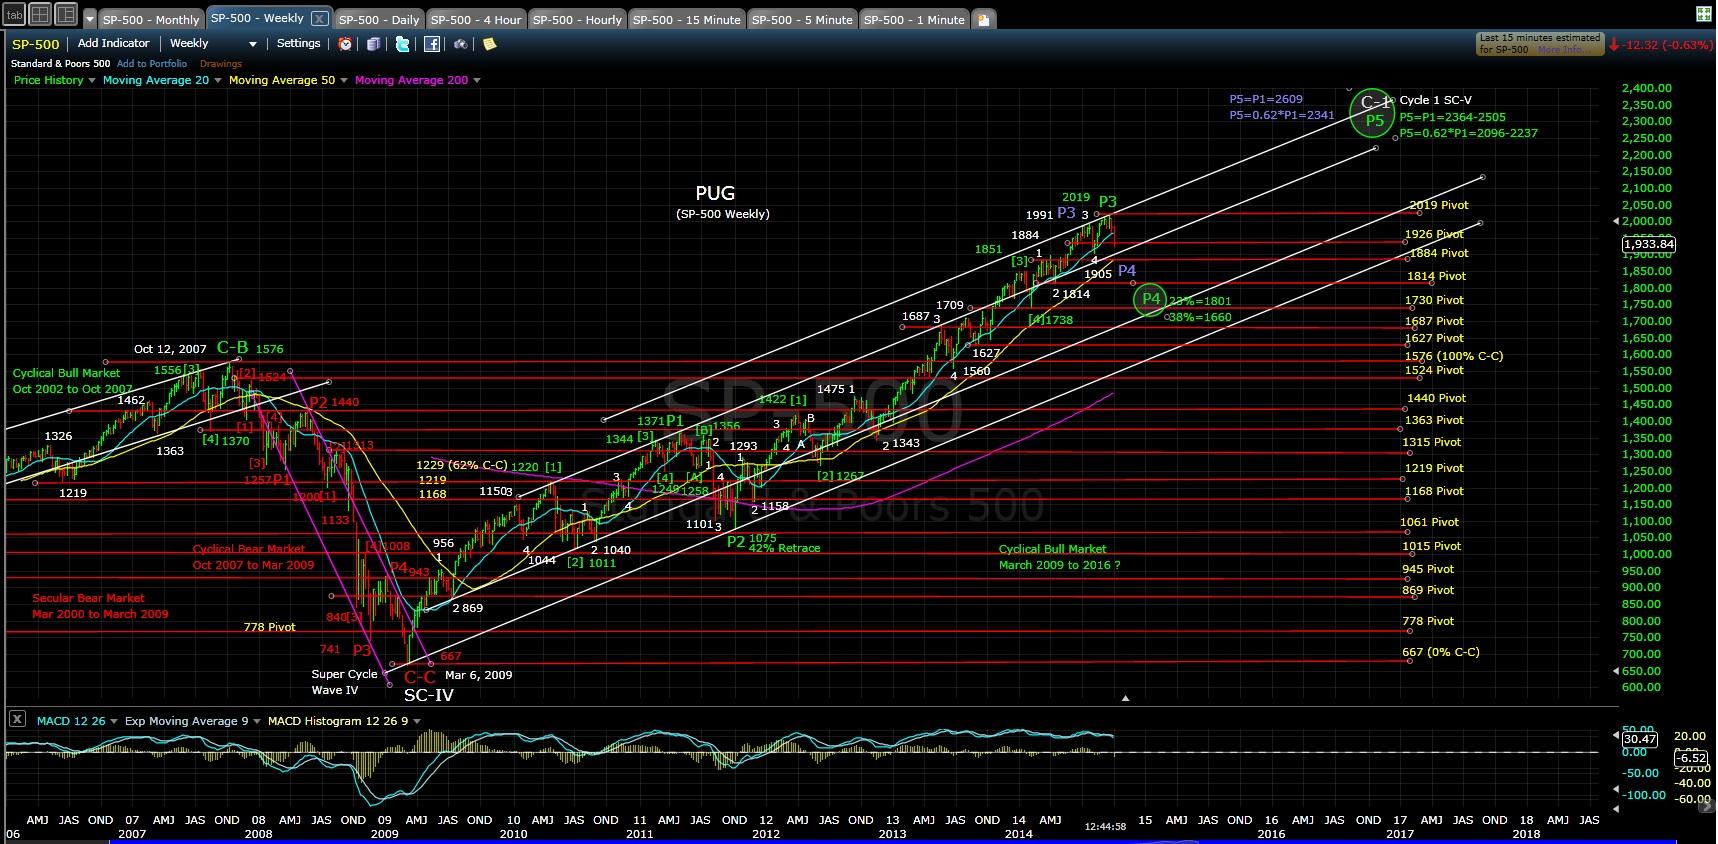 PUG SP-500 weekly chart 10-2-14